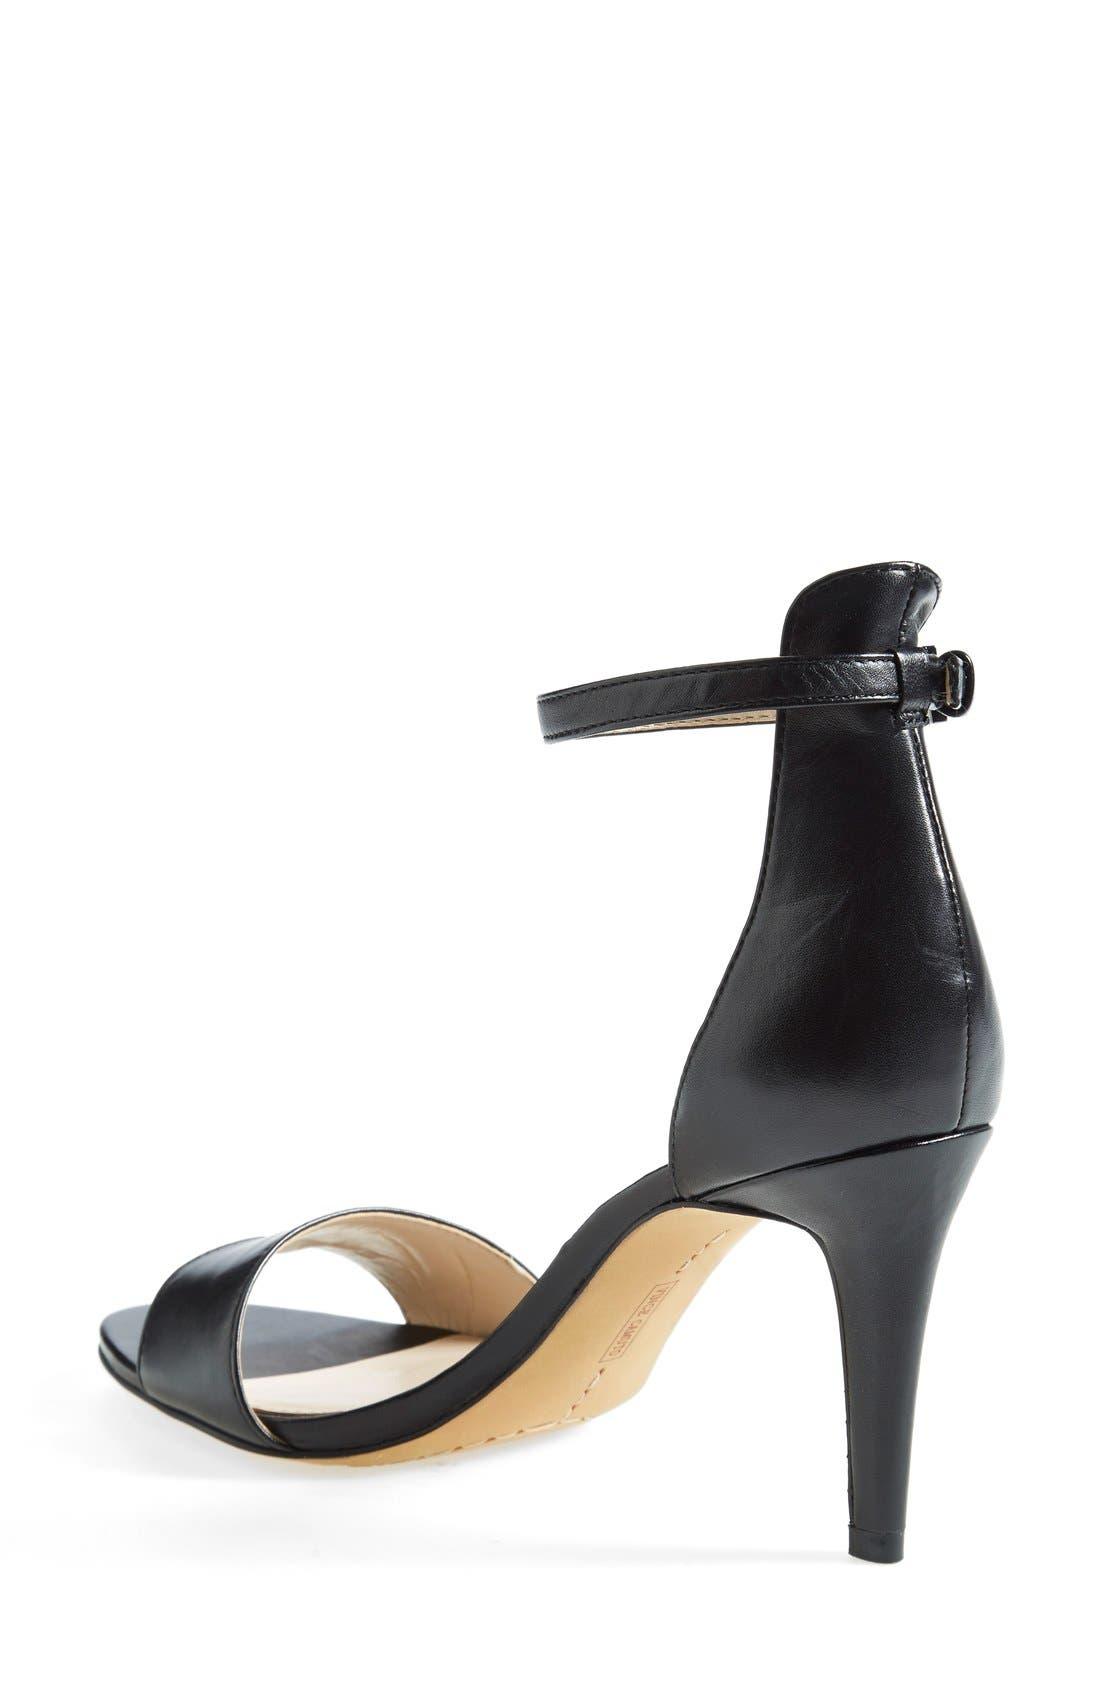 'Court' Ankle Strap Sandal,                             Alternate thumbnail 3, color,                             001